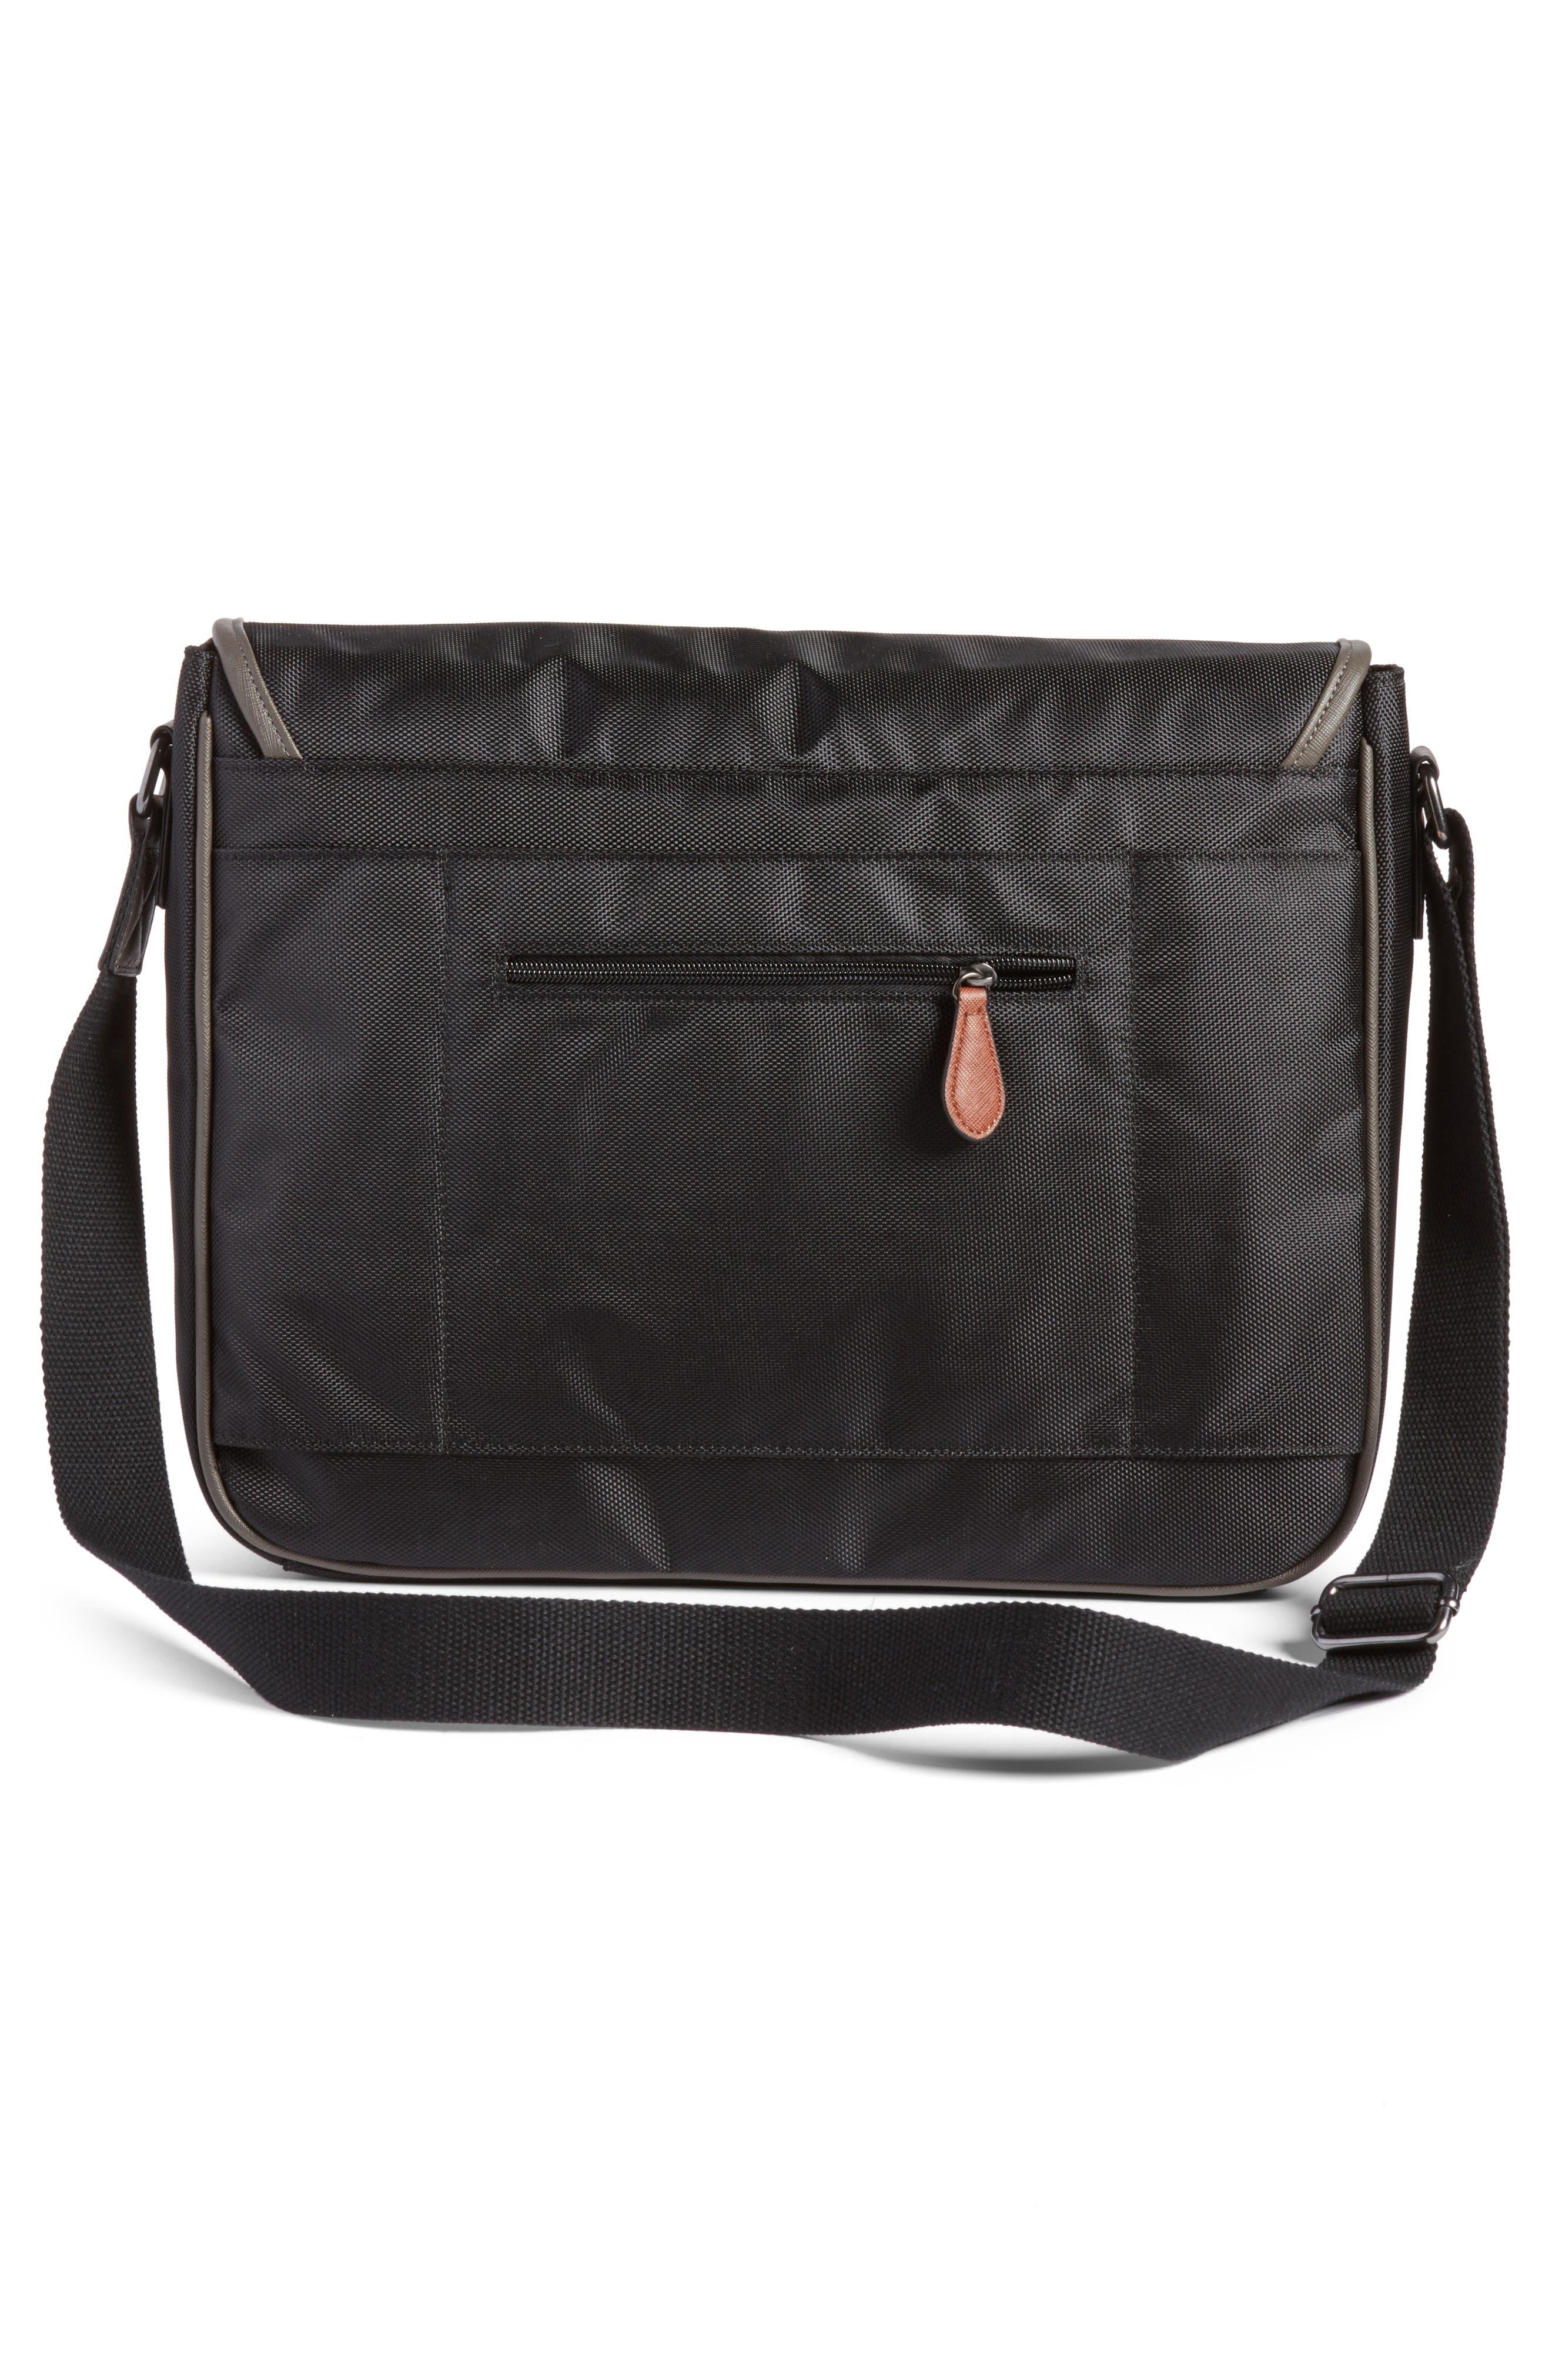 Wisker Messenger Bag,                             Alternate thumbnail 3, color,                             001